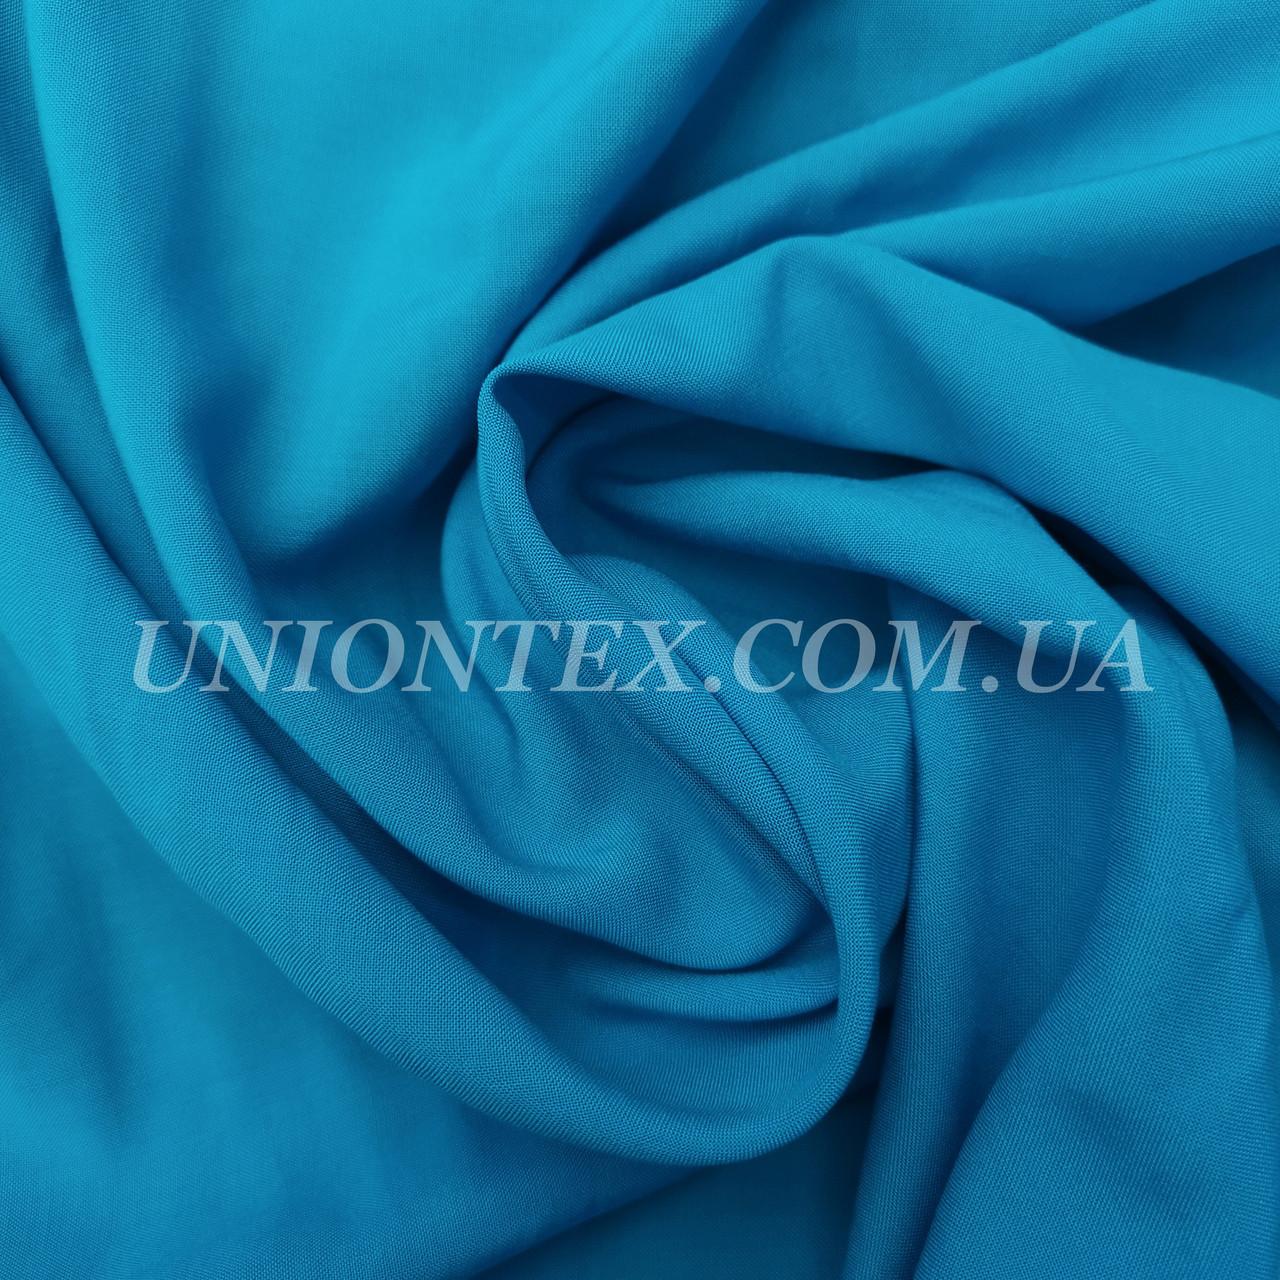 Ткань штапель голубая бирюза